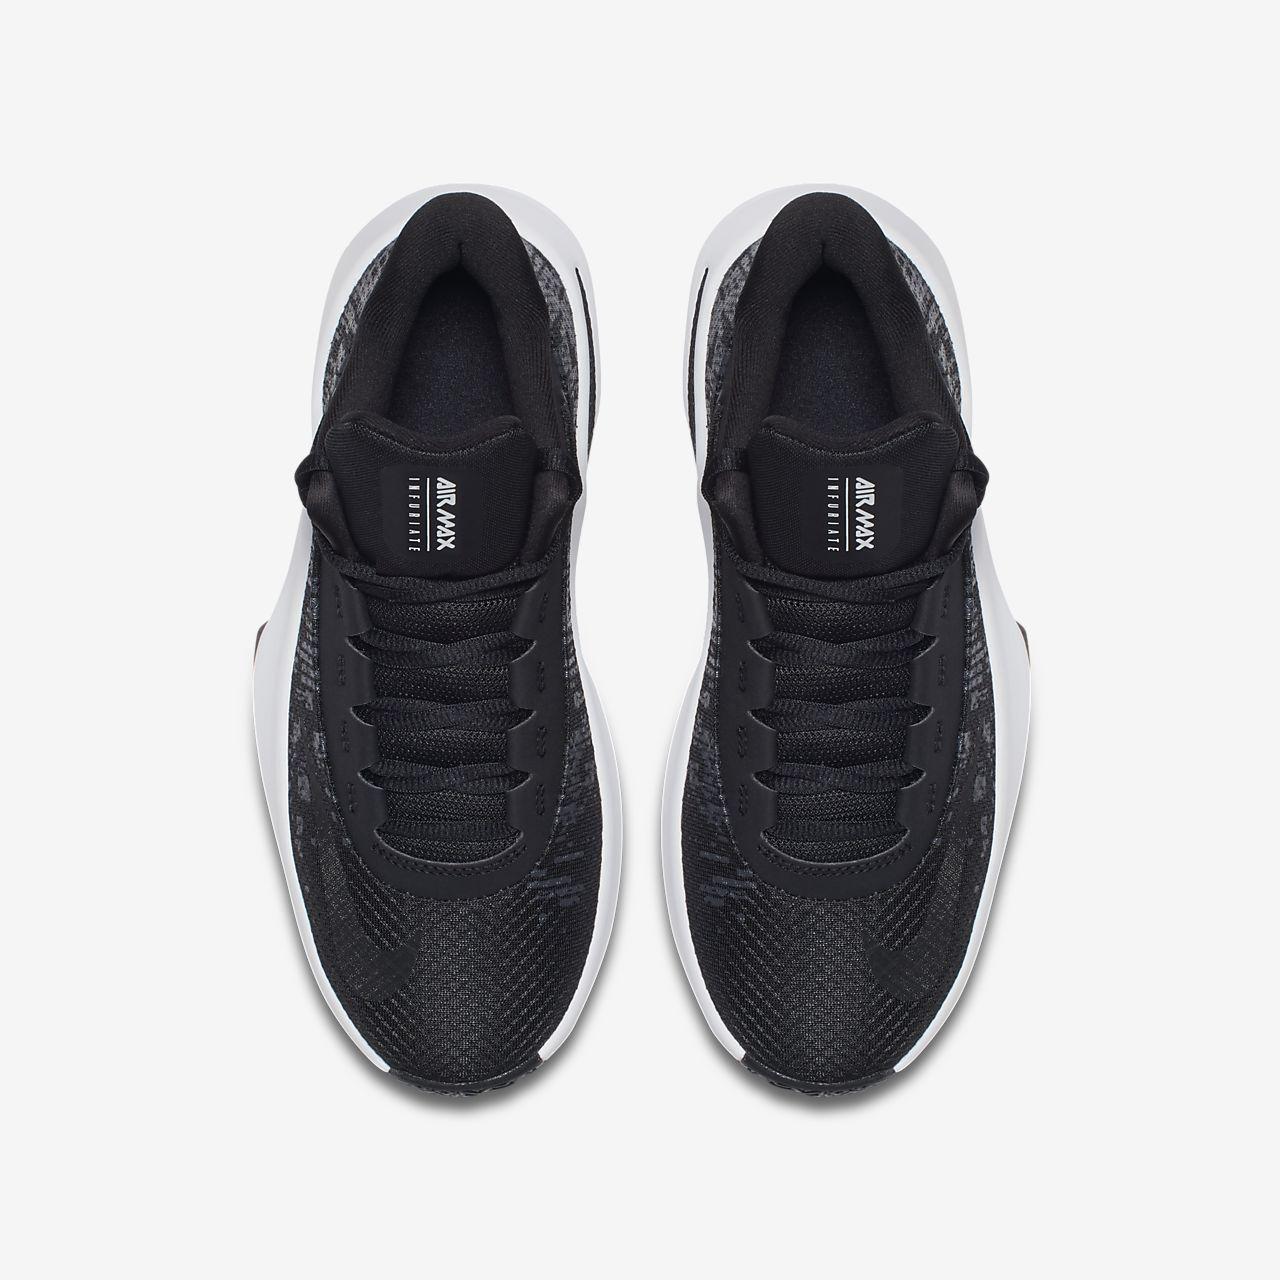 87d66b4ac8 ... Nike Air Max Infuriate II Mid Younger/Older Kids' Basketball Shoe